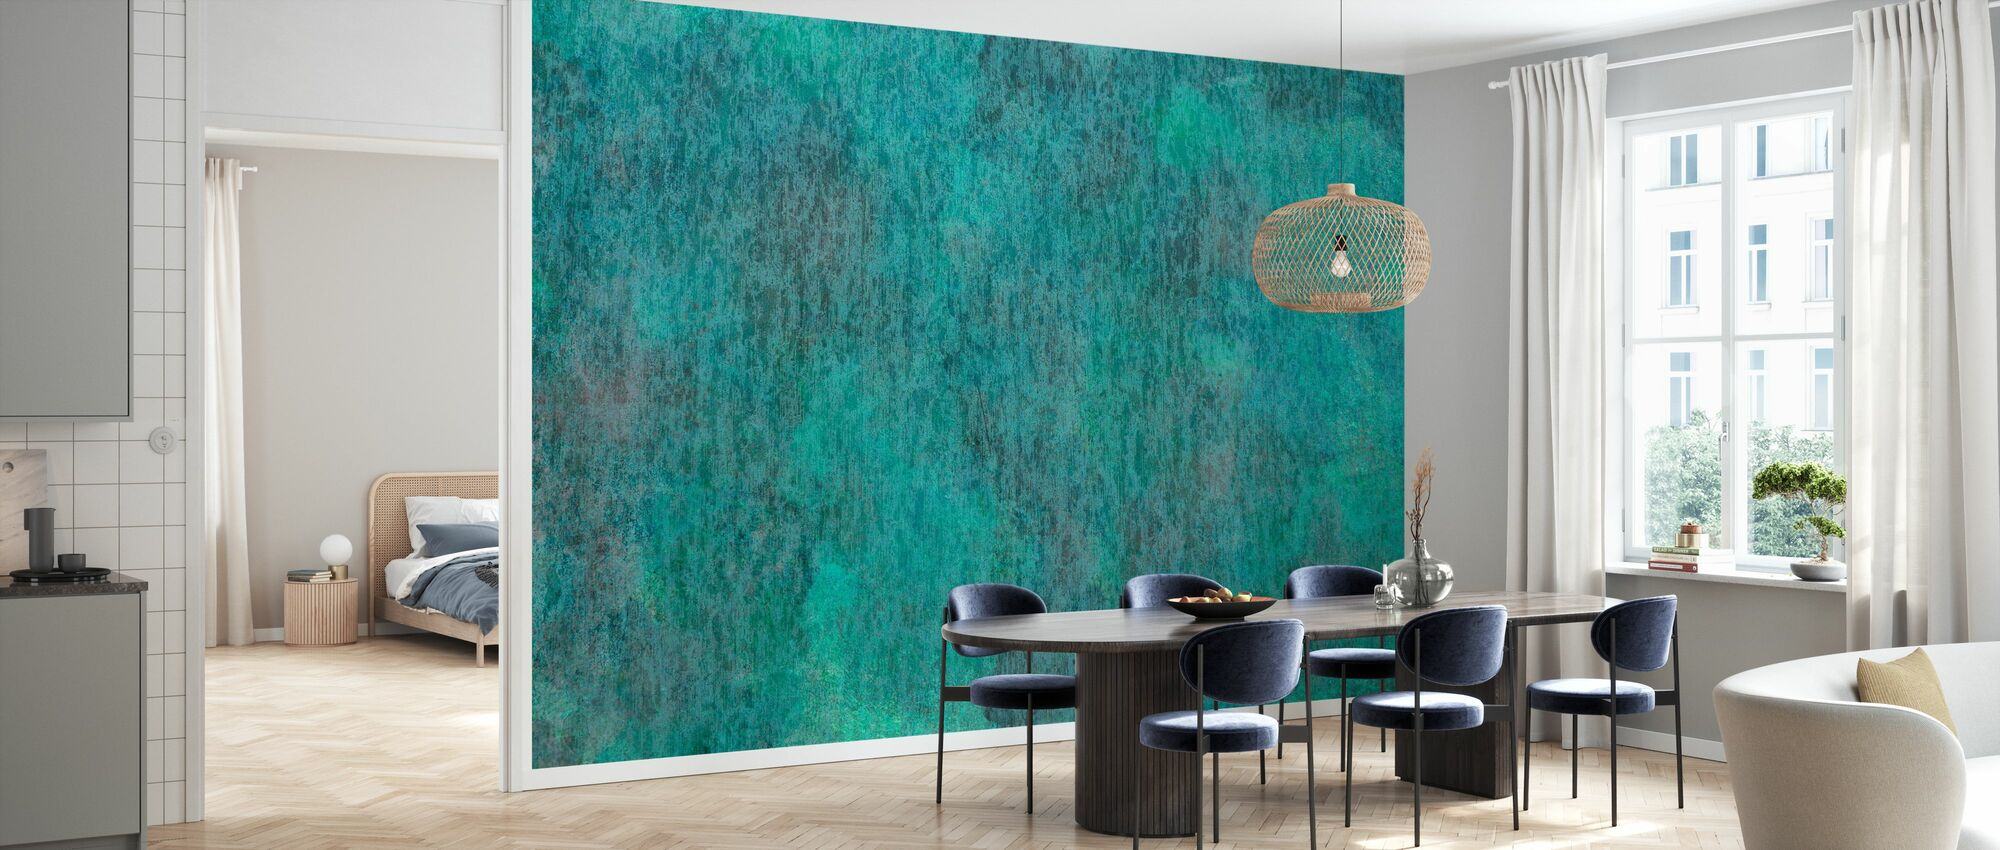 Copper Oxidation on Metal - Wallpaper - Kitchen